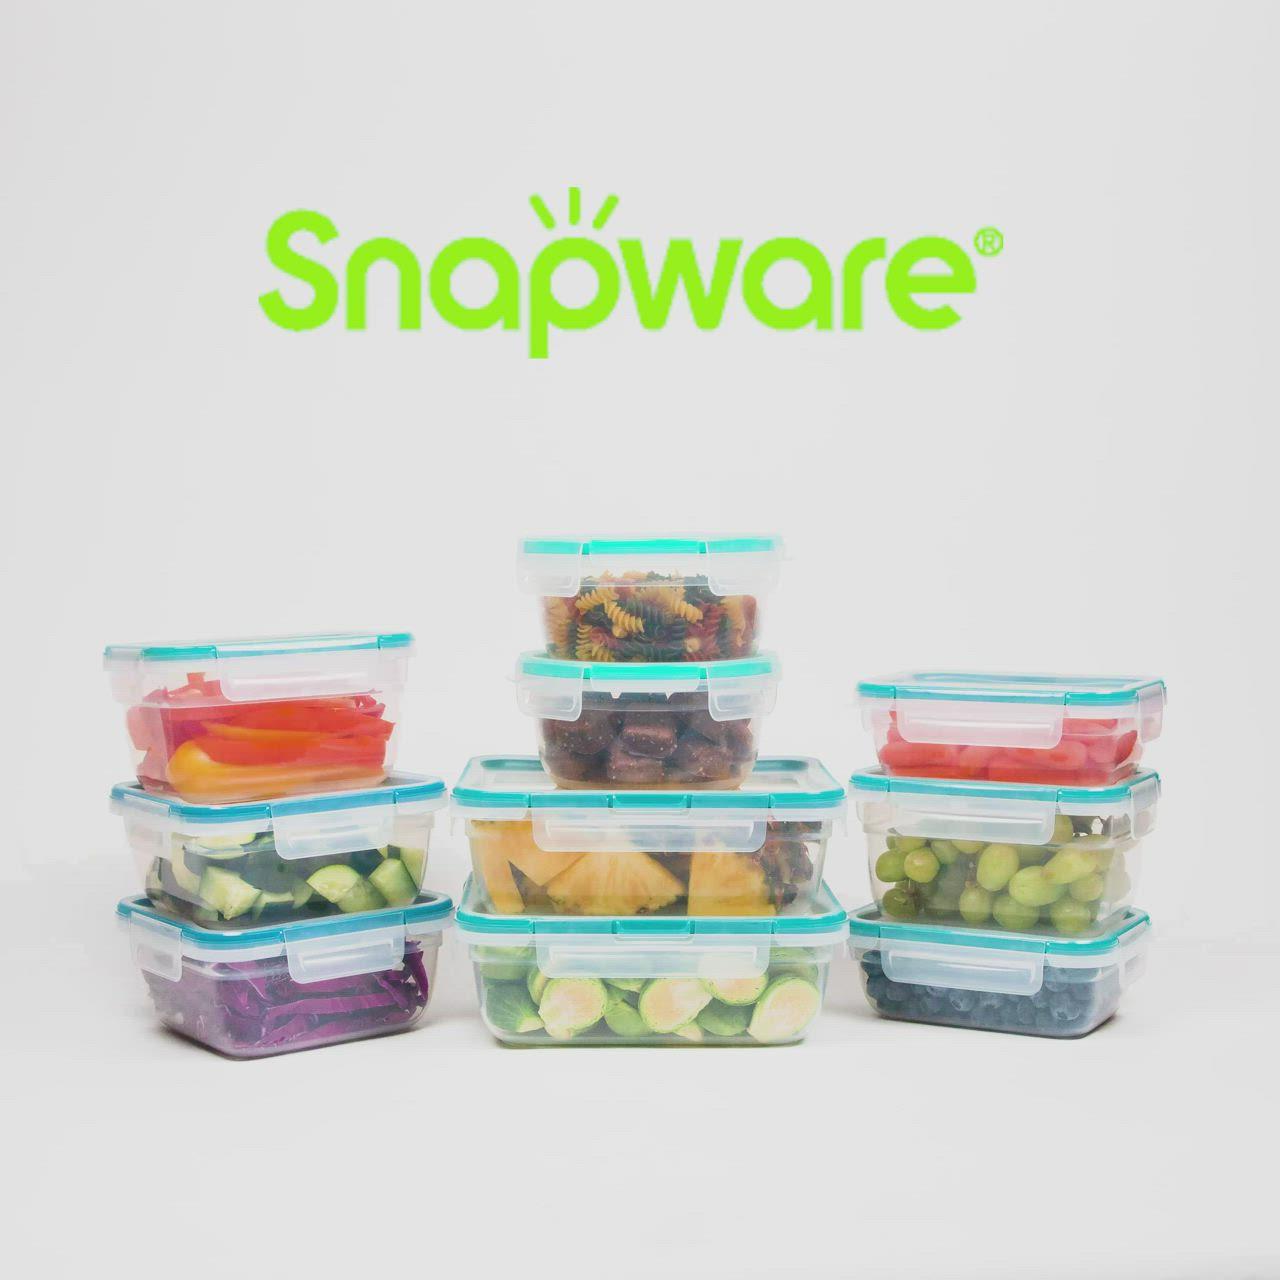 Snapware 38 Piece Plastic Food Storage Set Video Video In 2020 Food Storage Set Snapware Food Storage